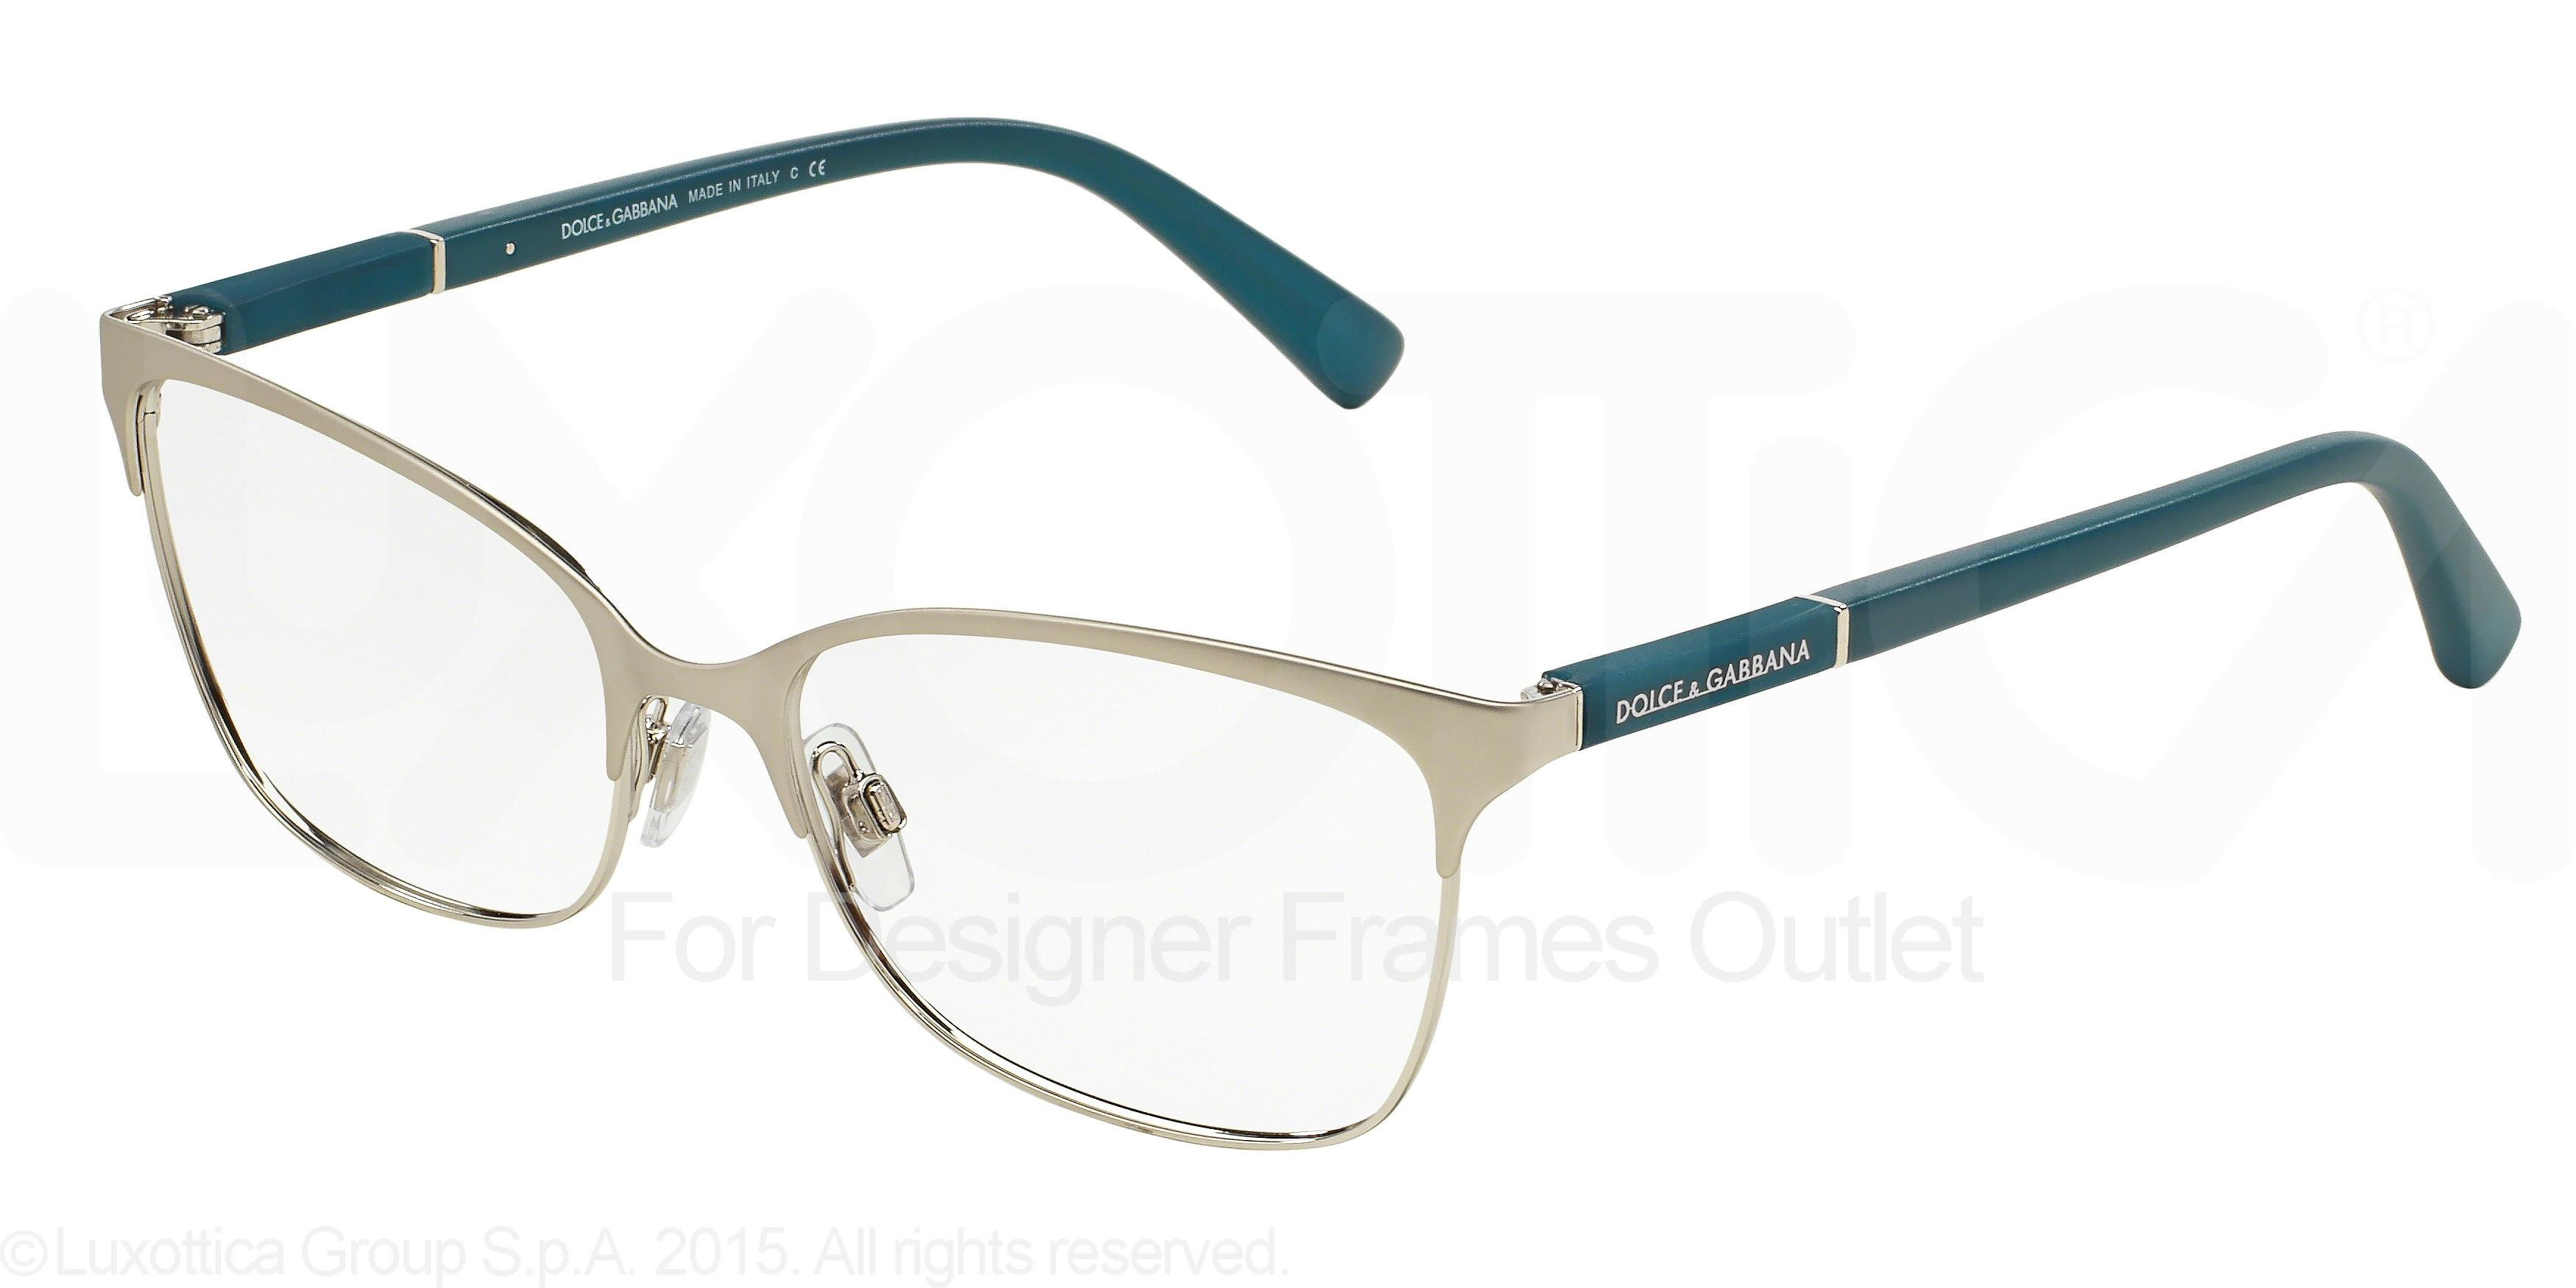 12fc2b937288 Designer Eyeglasses Clearance